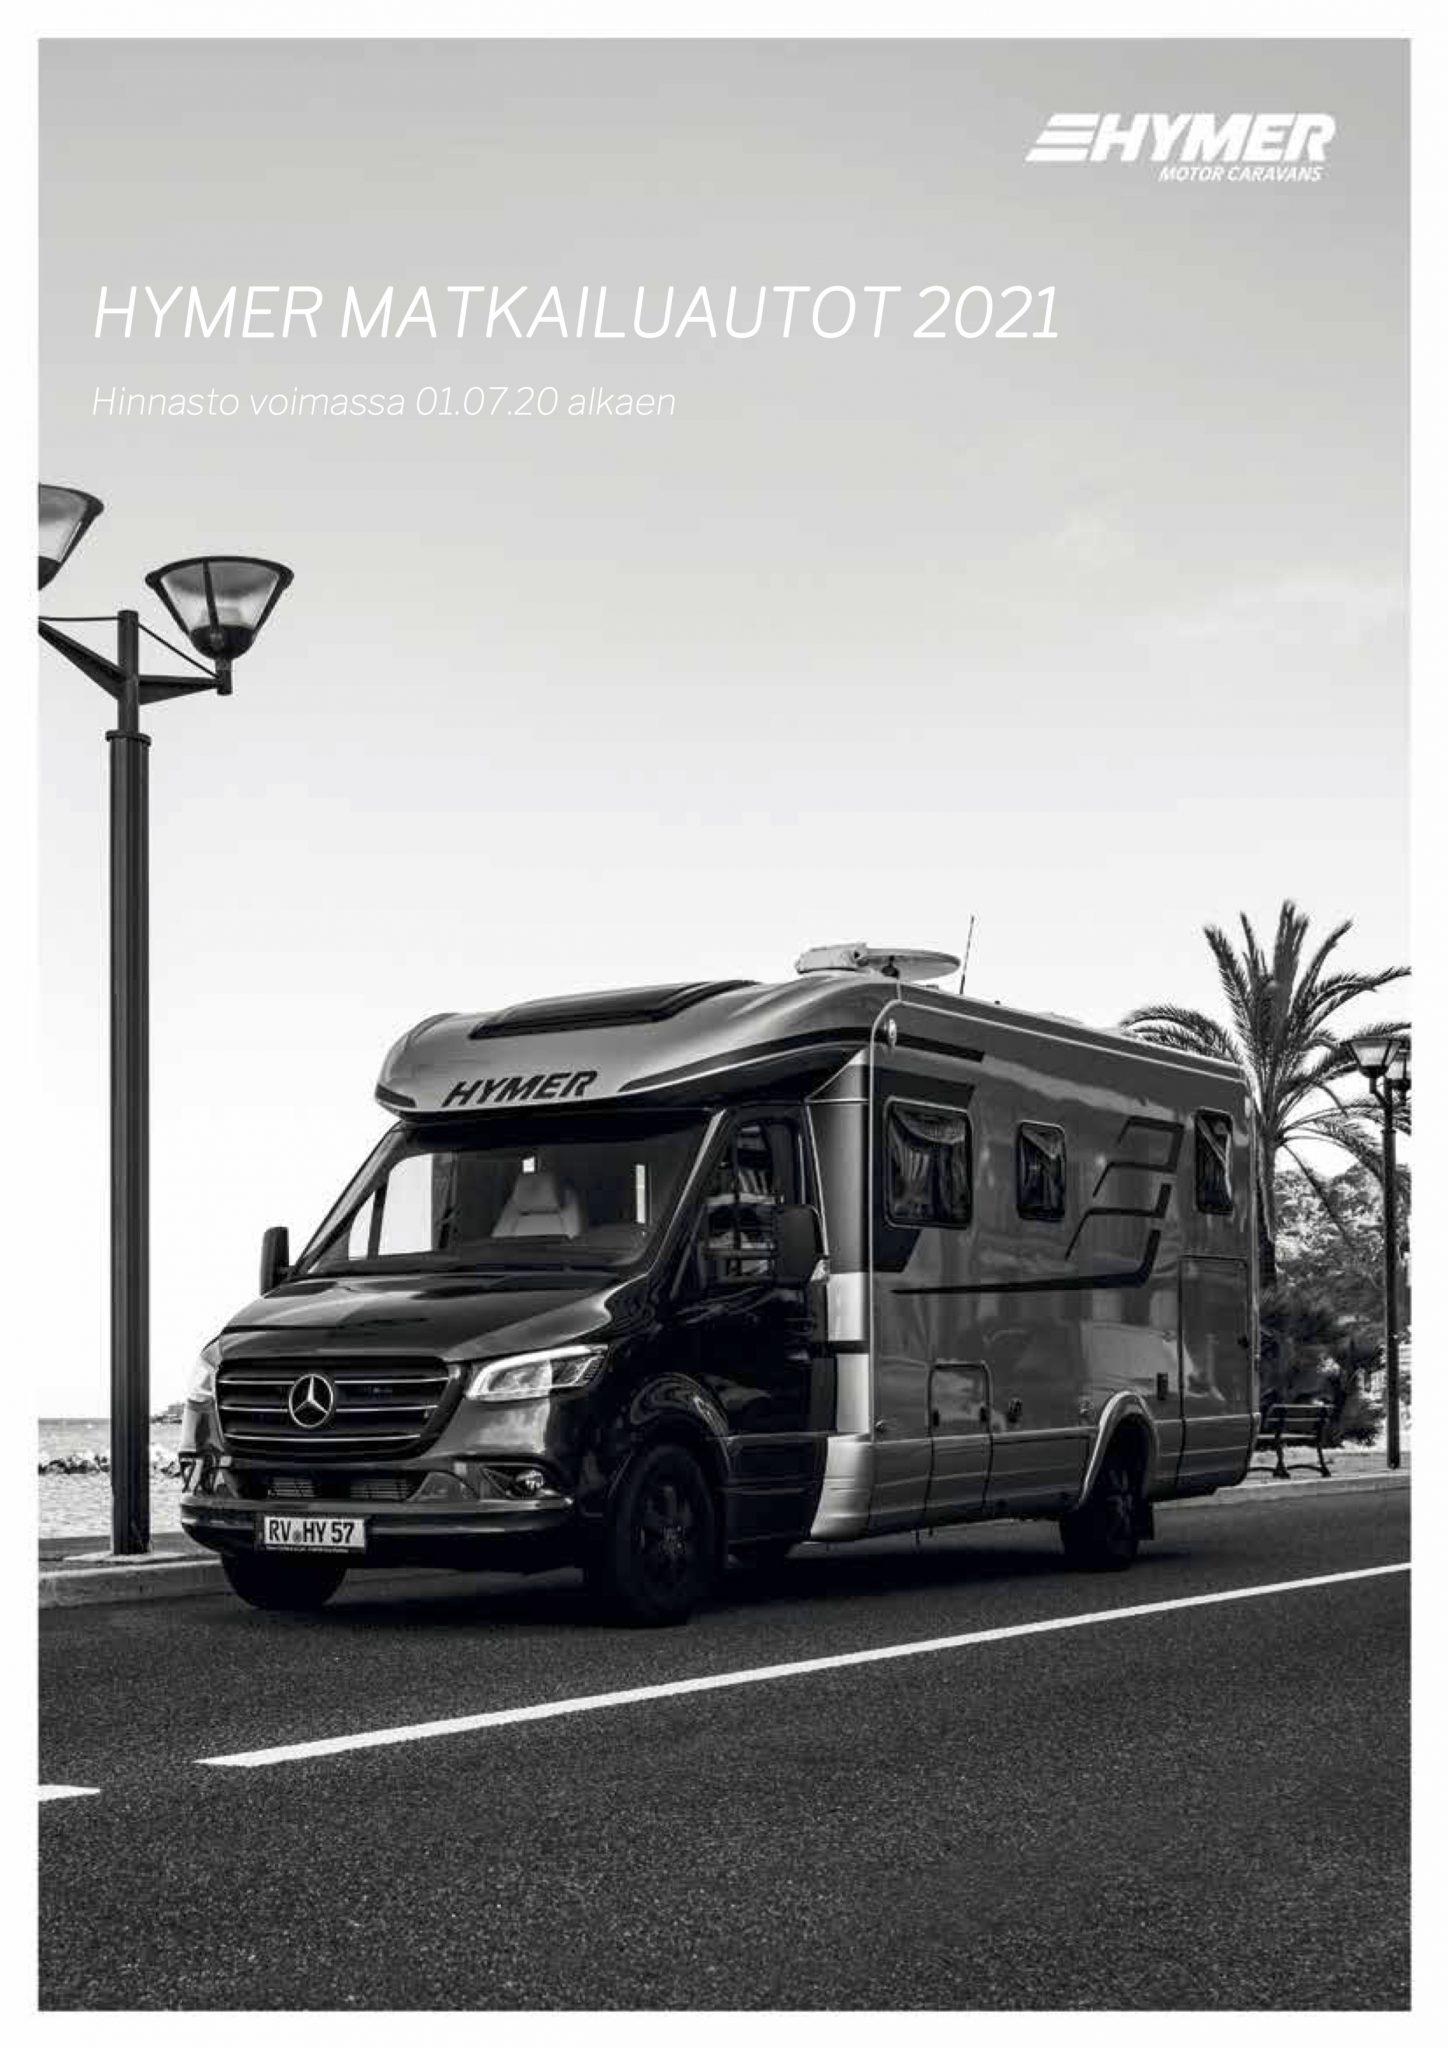 Hymer-matkailuautot 2021